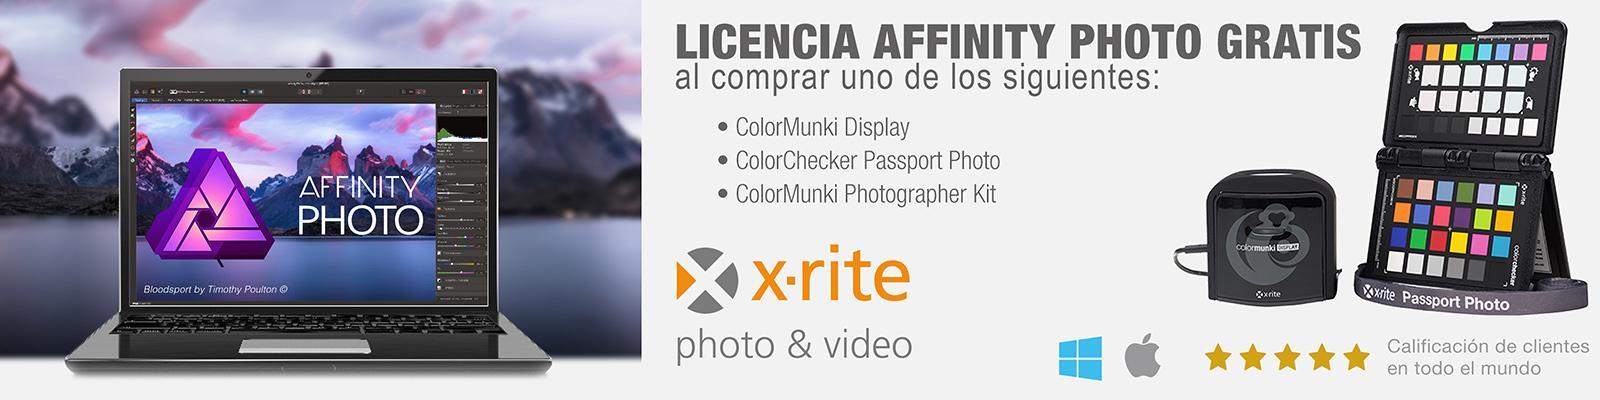 Ofertas X-Rite con software Affinity